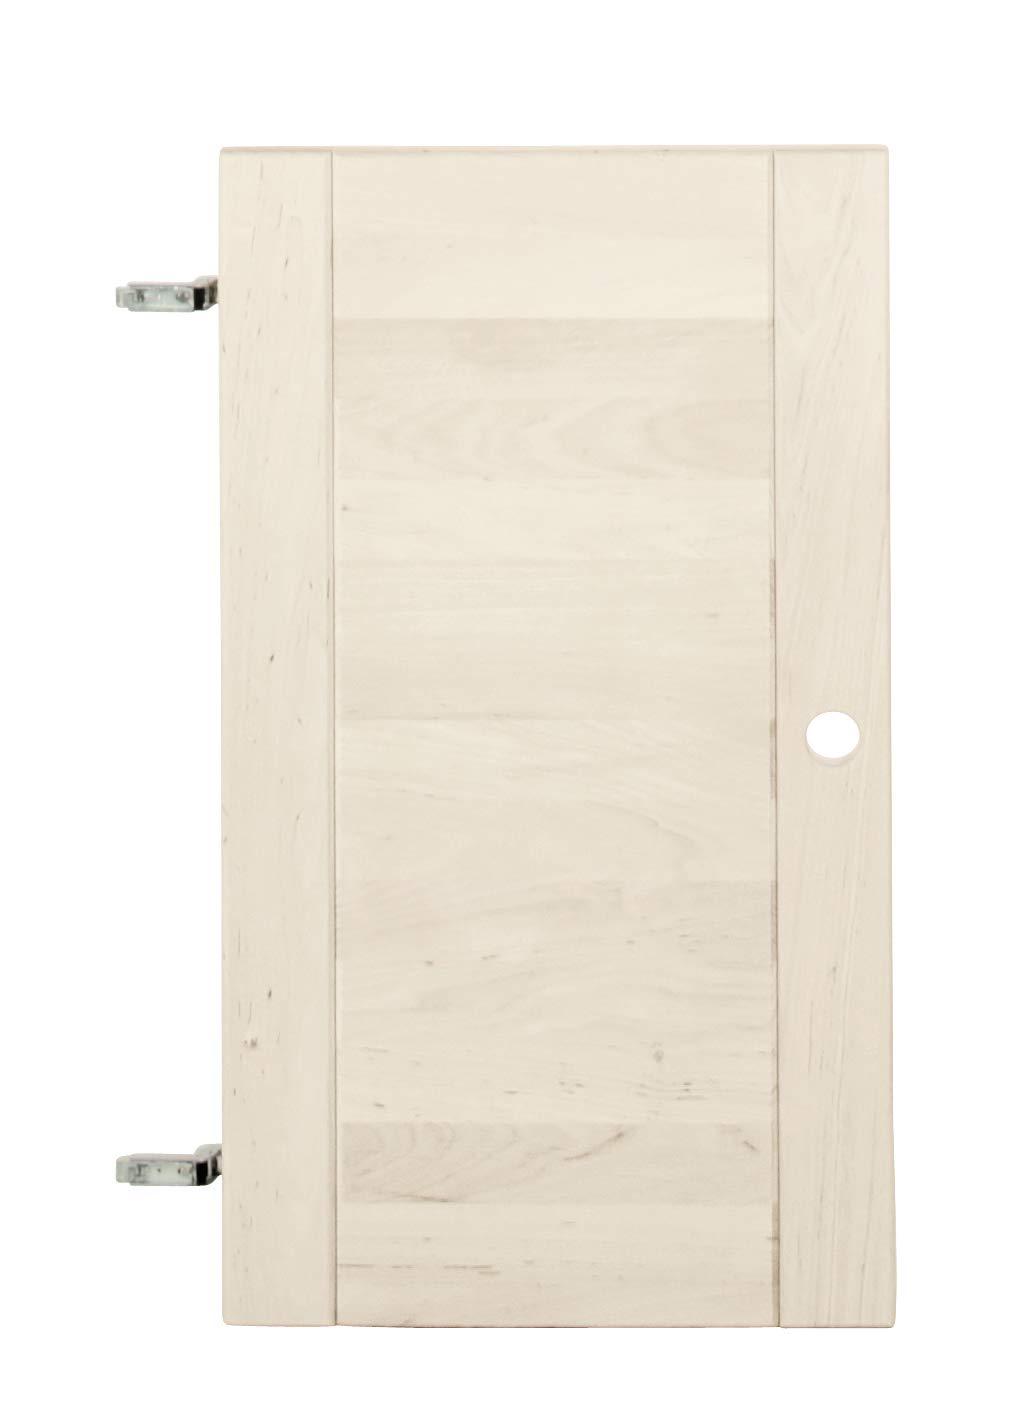 BioKinder 24146 Lara Tür Regaltür rechts/Links aus Massivholz Kiefer weiß lasiert, Maße:200 cm